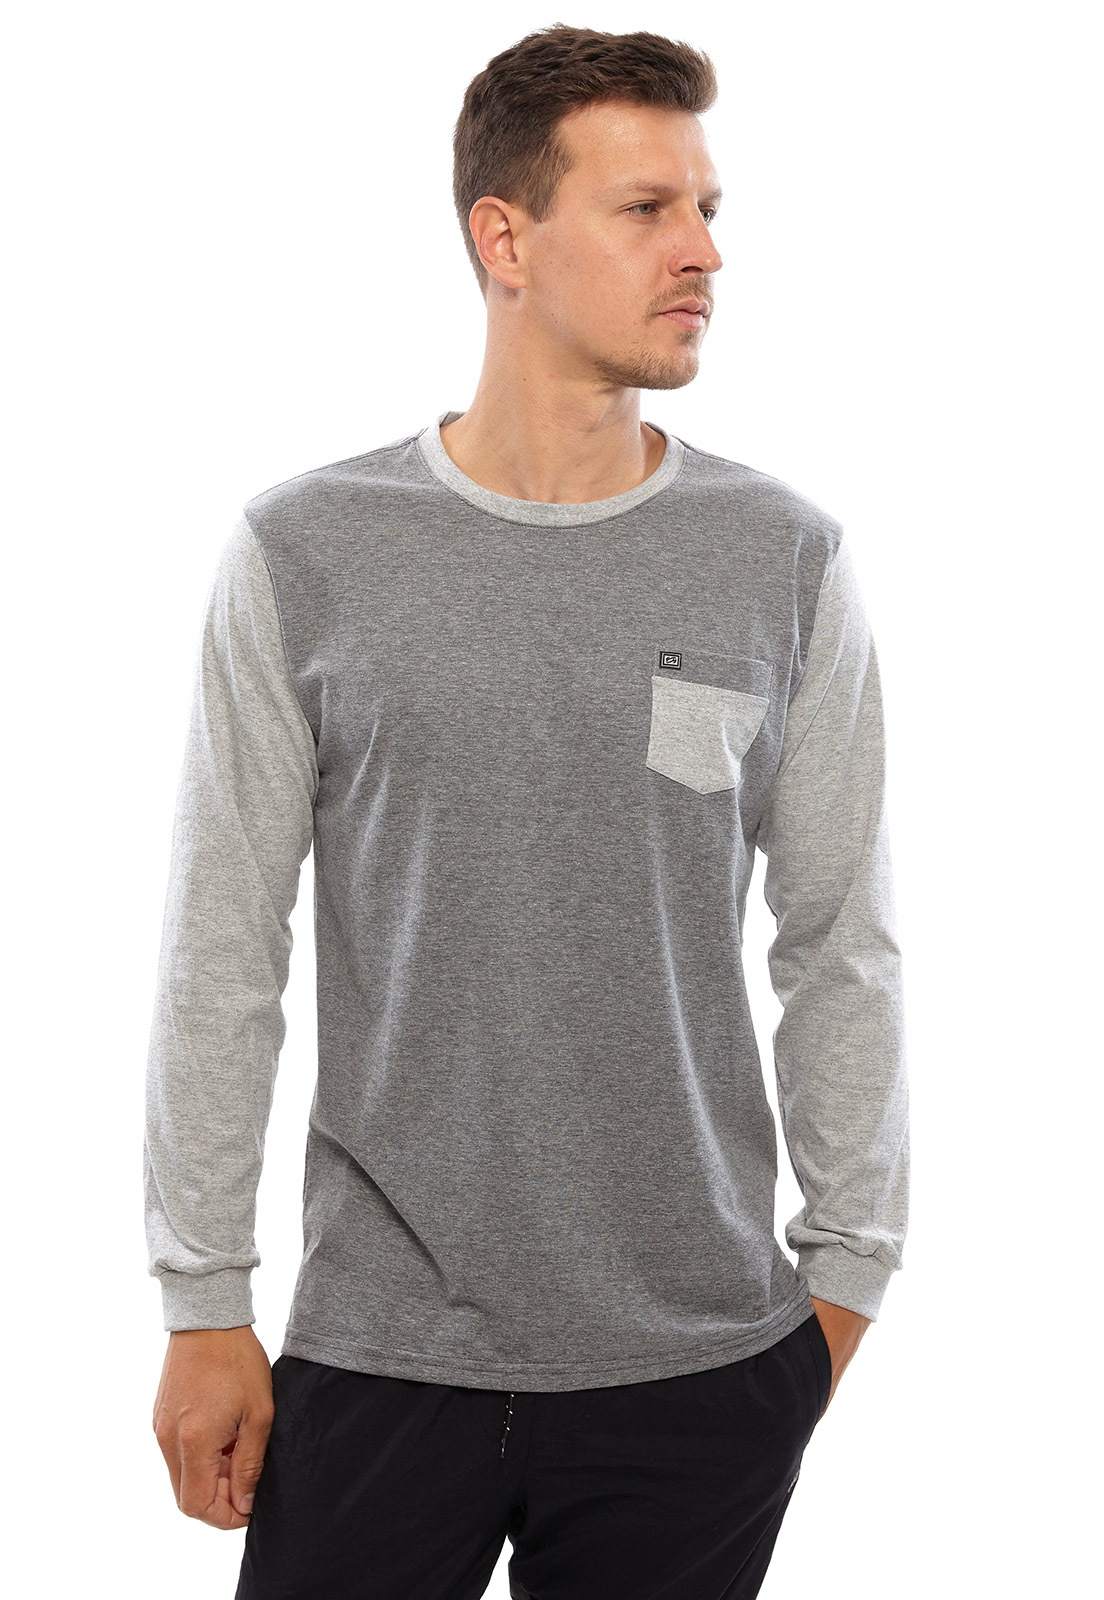 Camiseta Vida Marinha Manga Longa Cinza